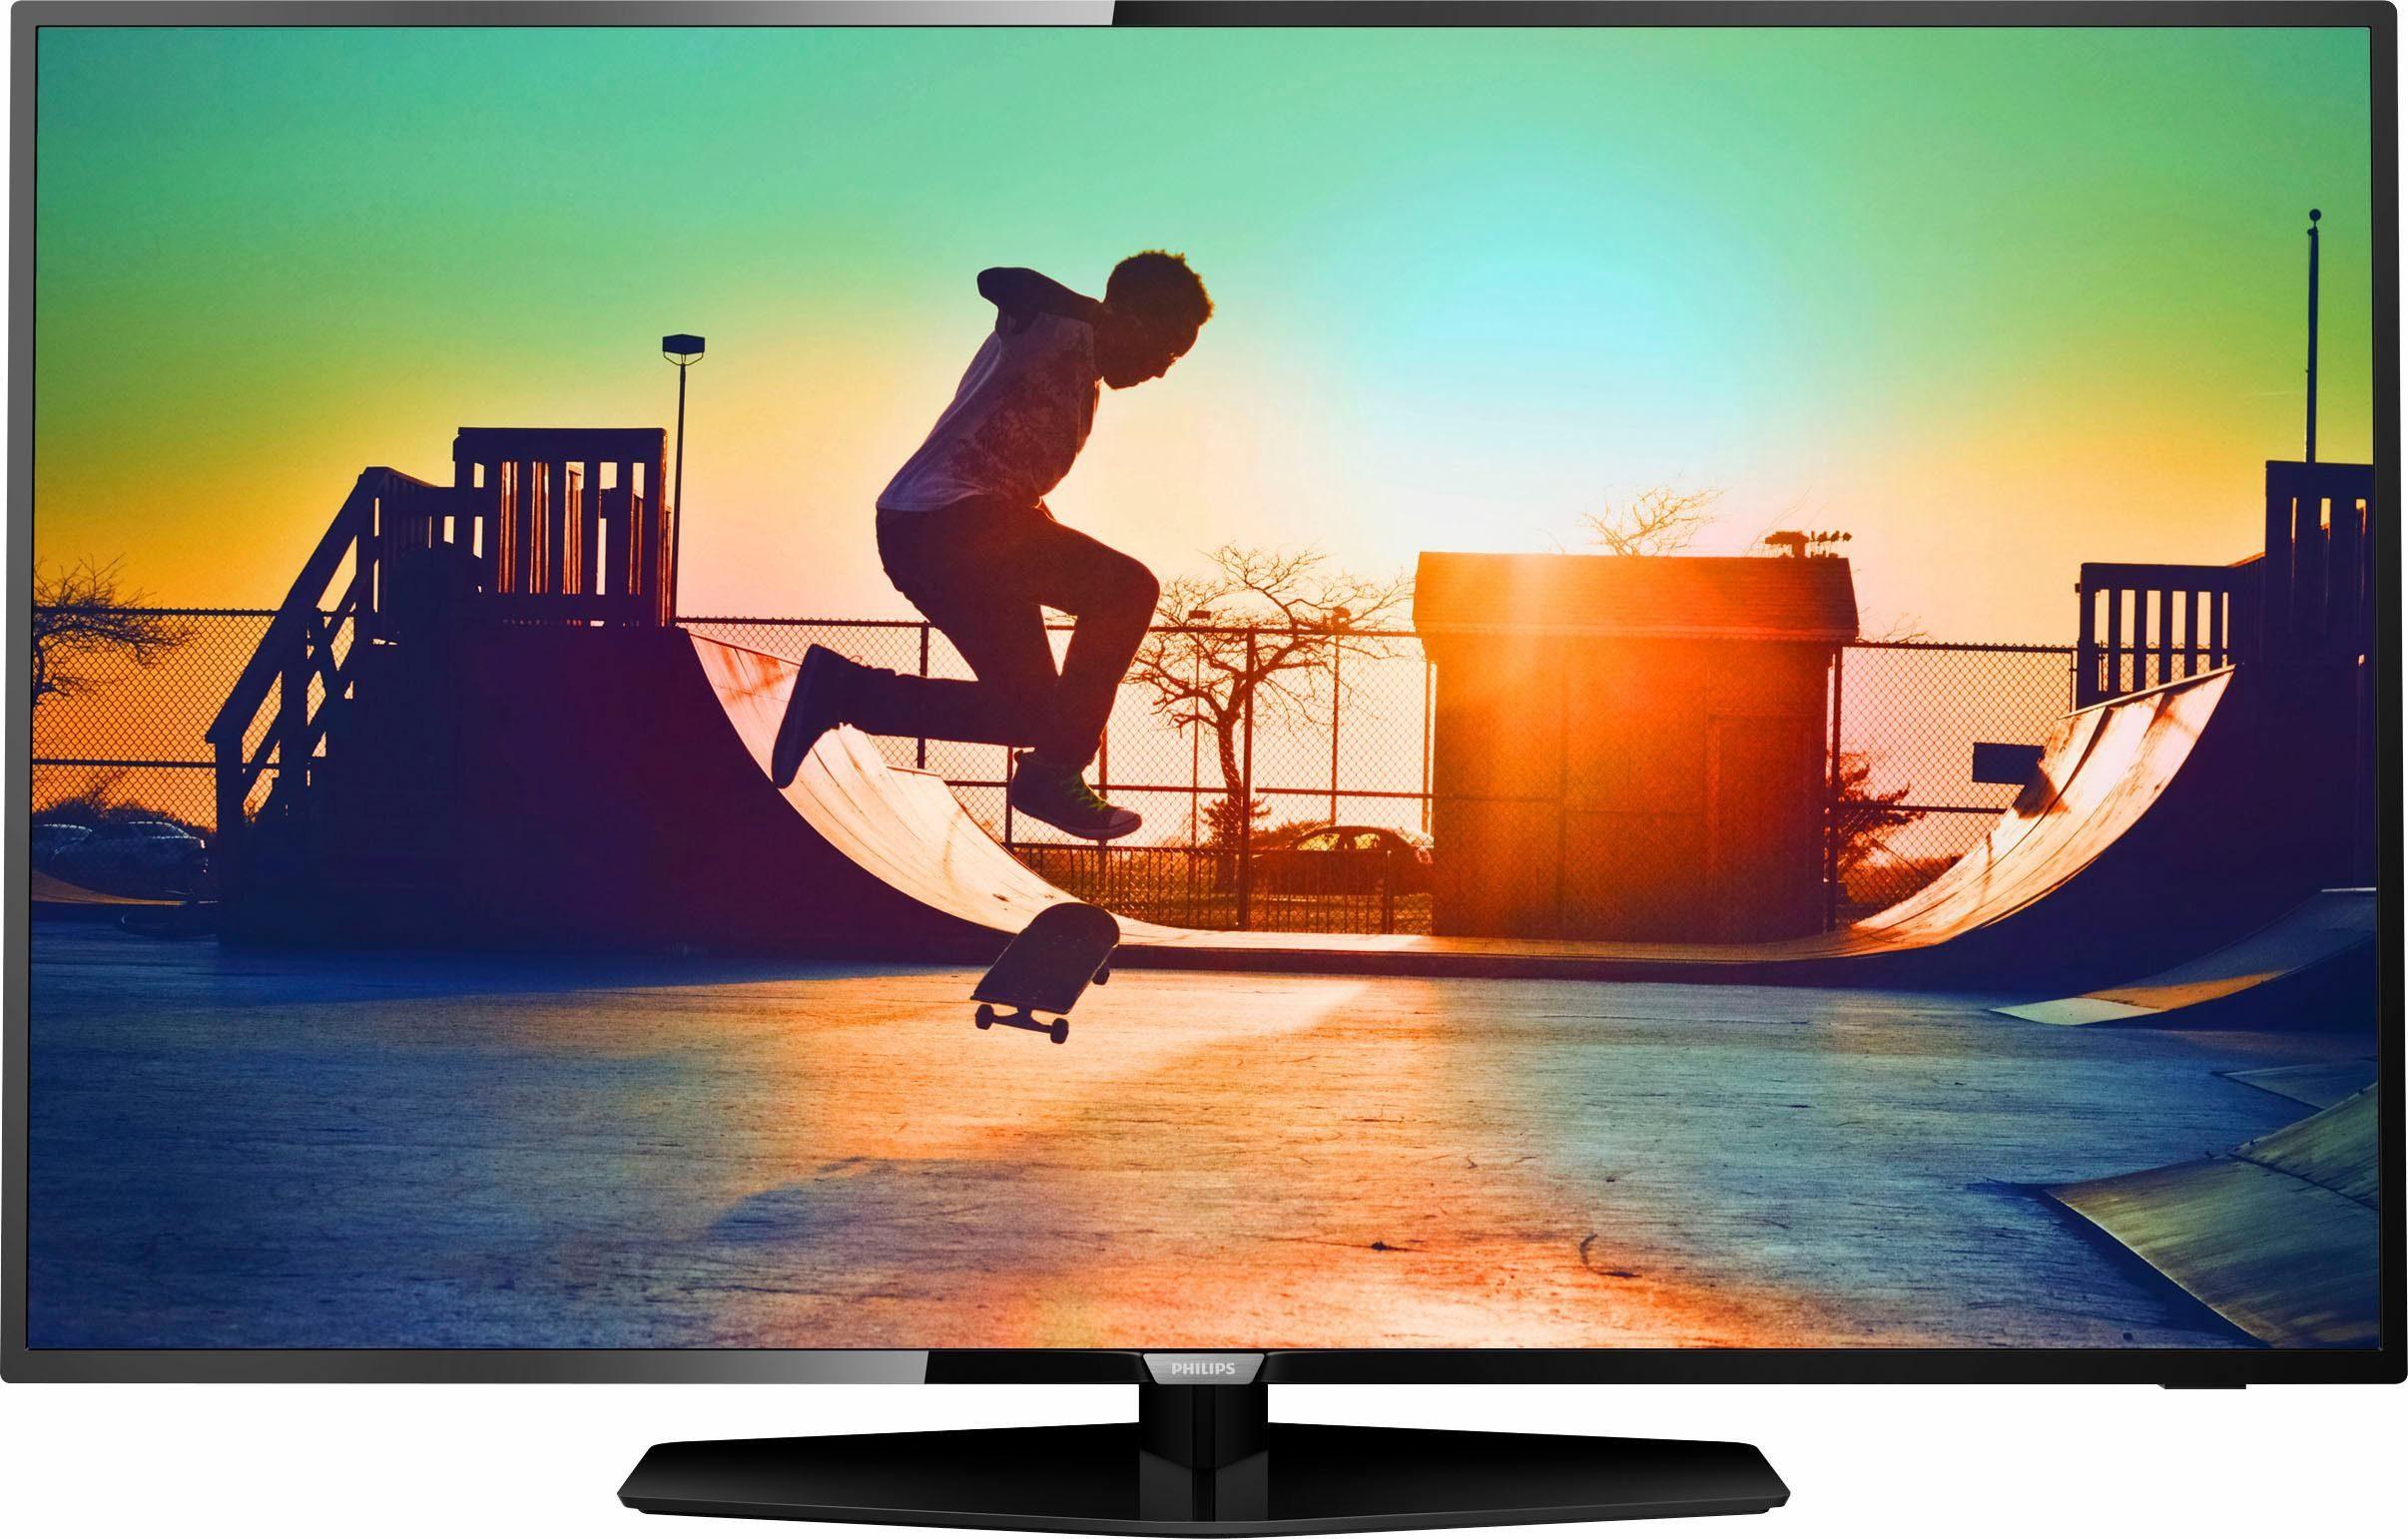 Philips 55PUS6162 LED-Fernseher (139 cm/55 Zoll, 4K Ultra HD, Smart-TV, 36 Monate Garantie)